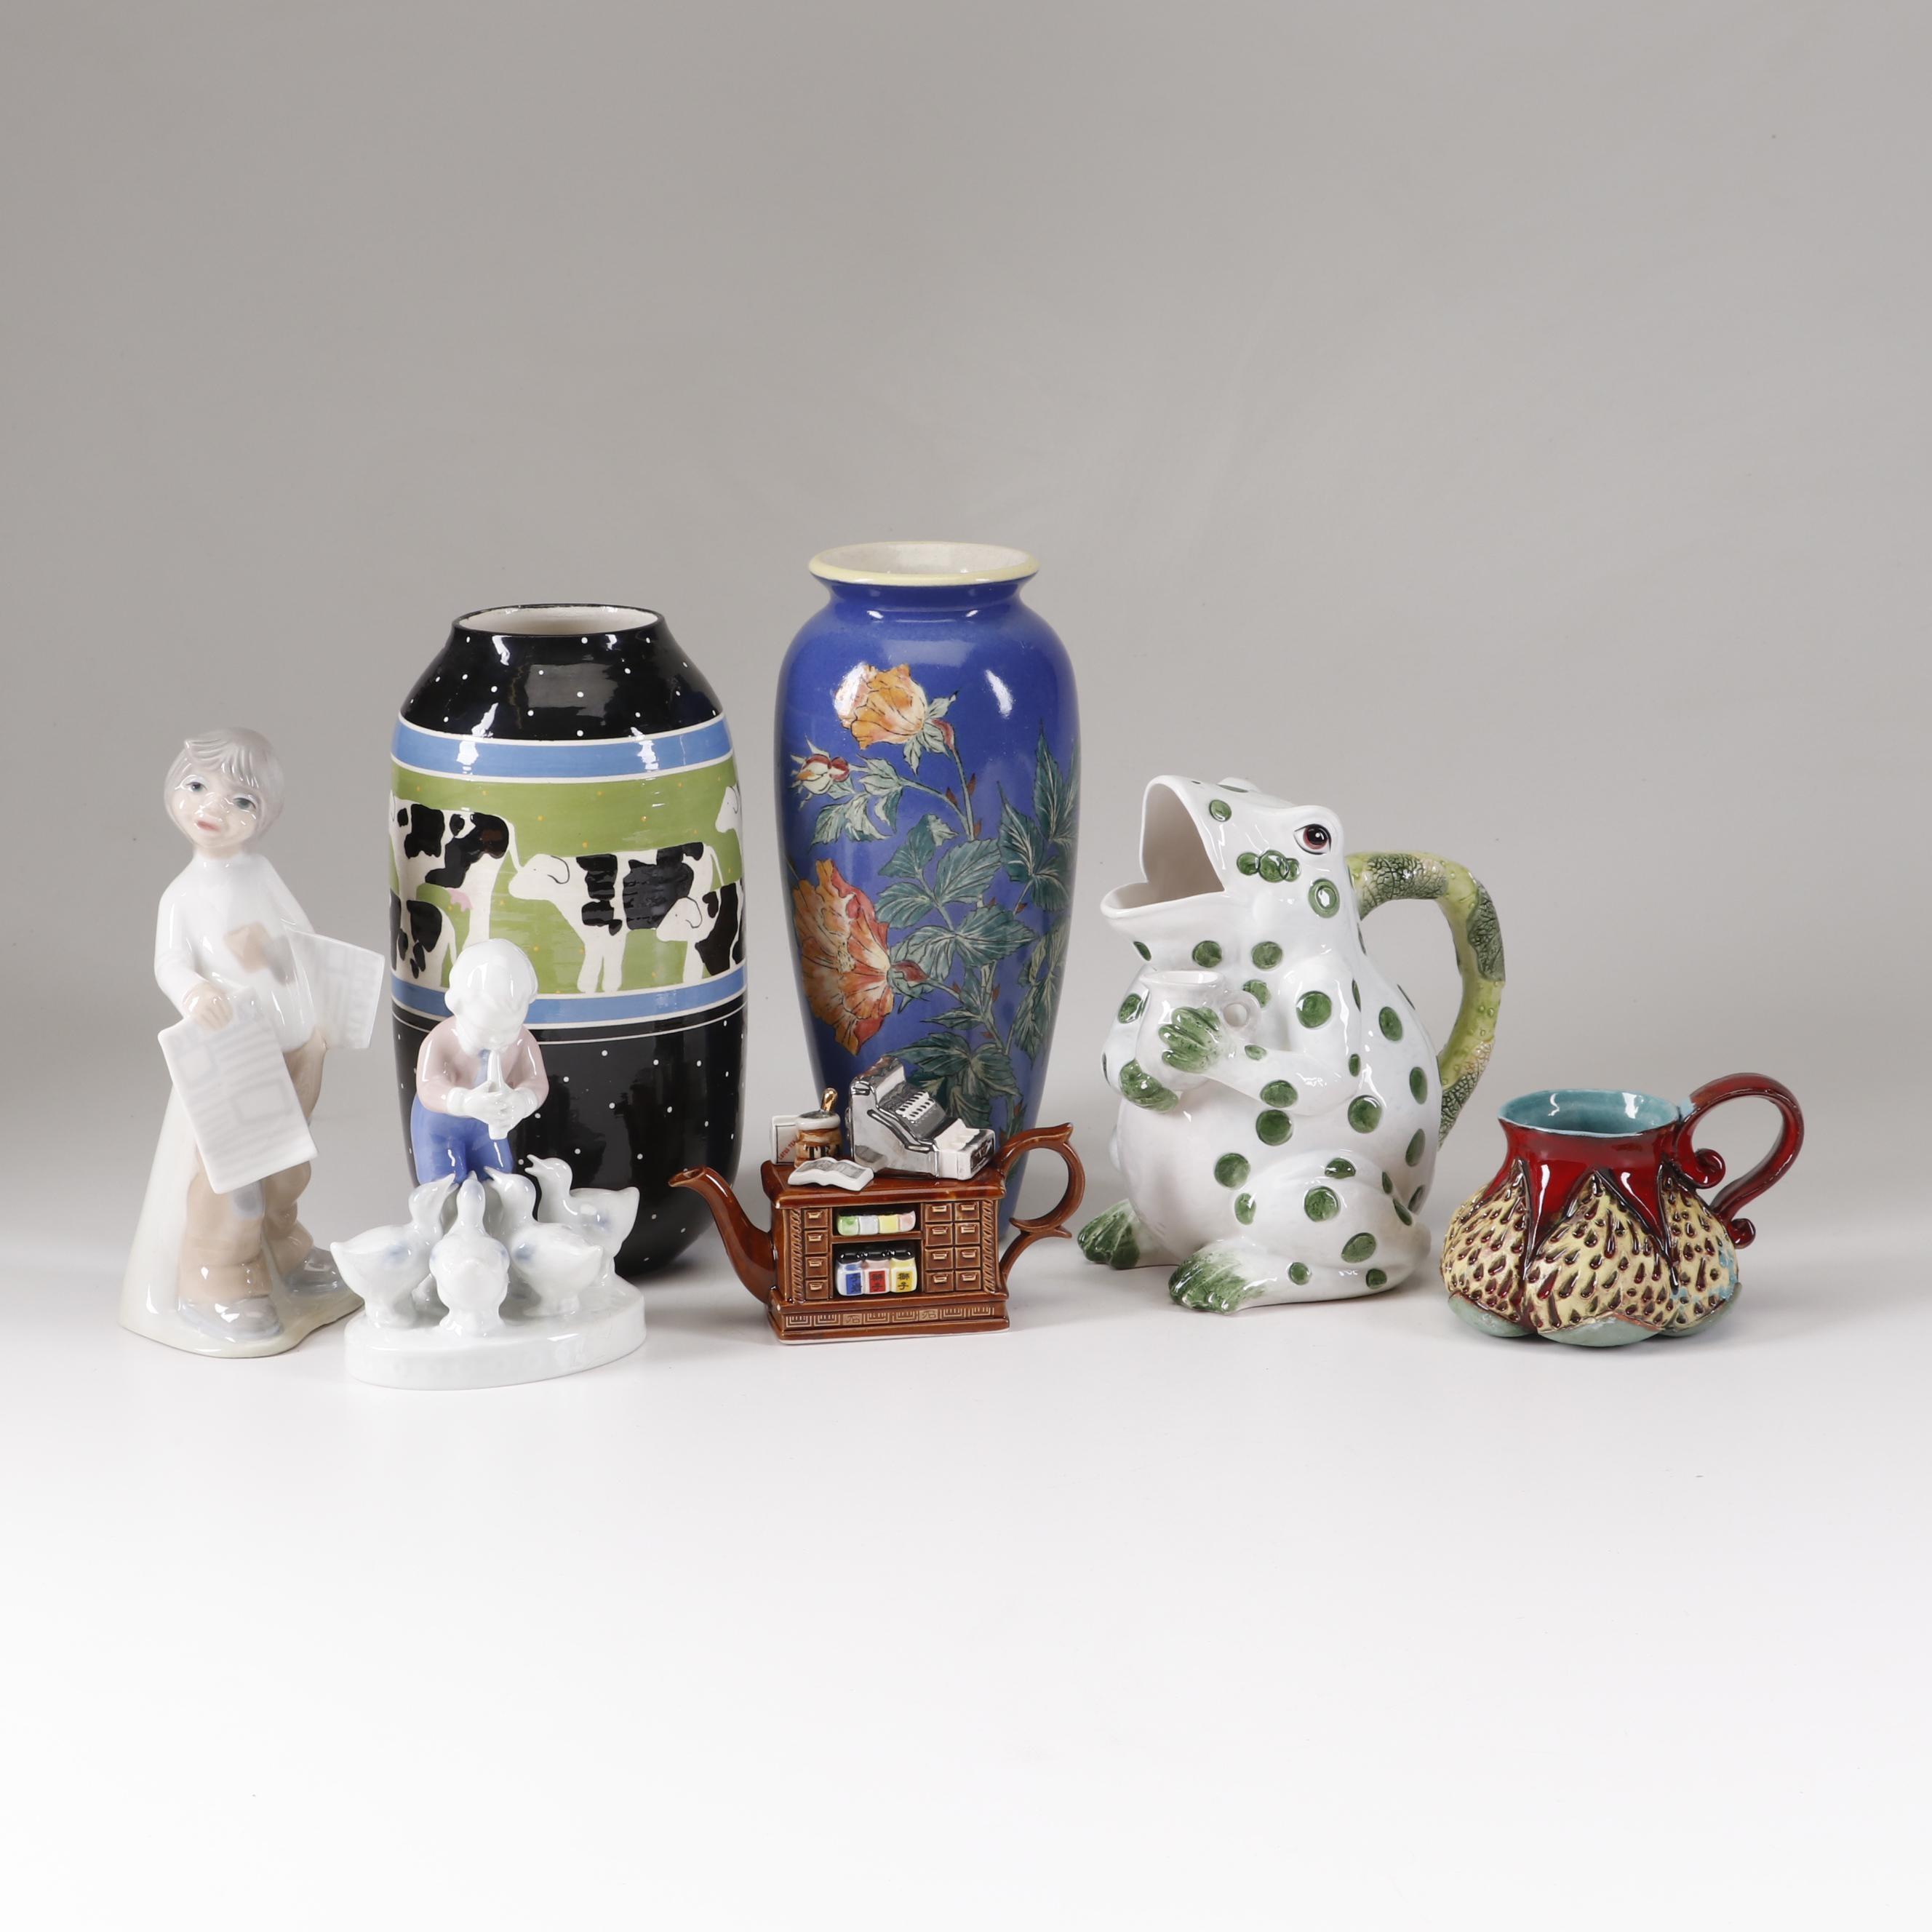 Pottery and Figurine Decor Including Santa Barbara Pottery